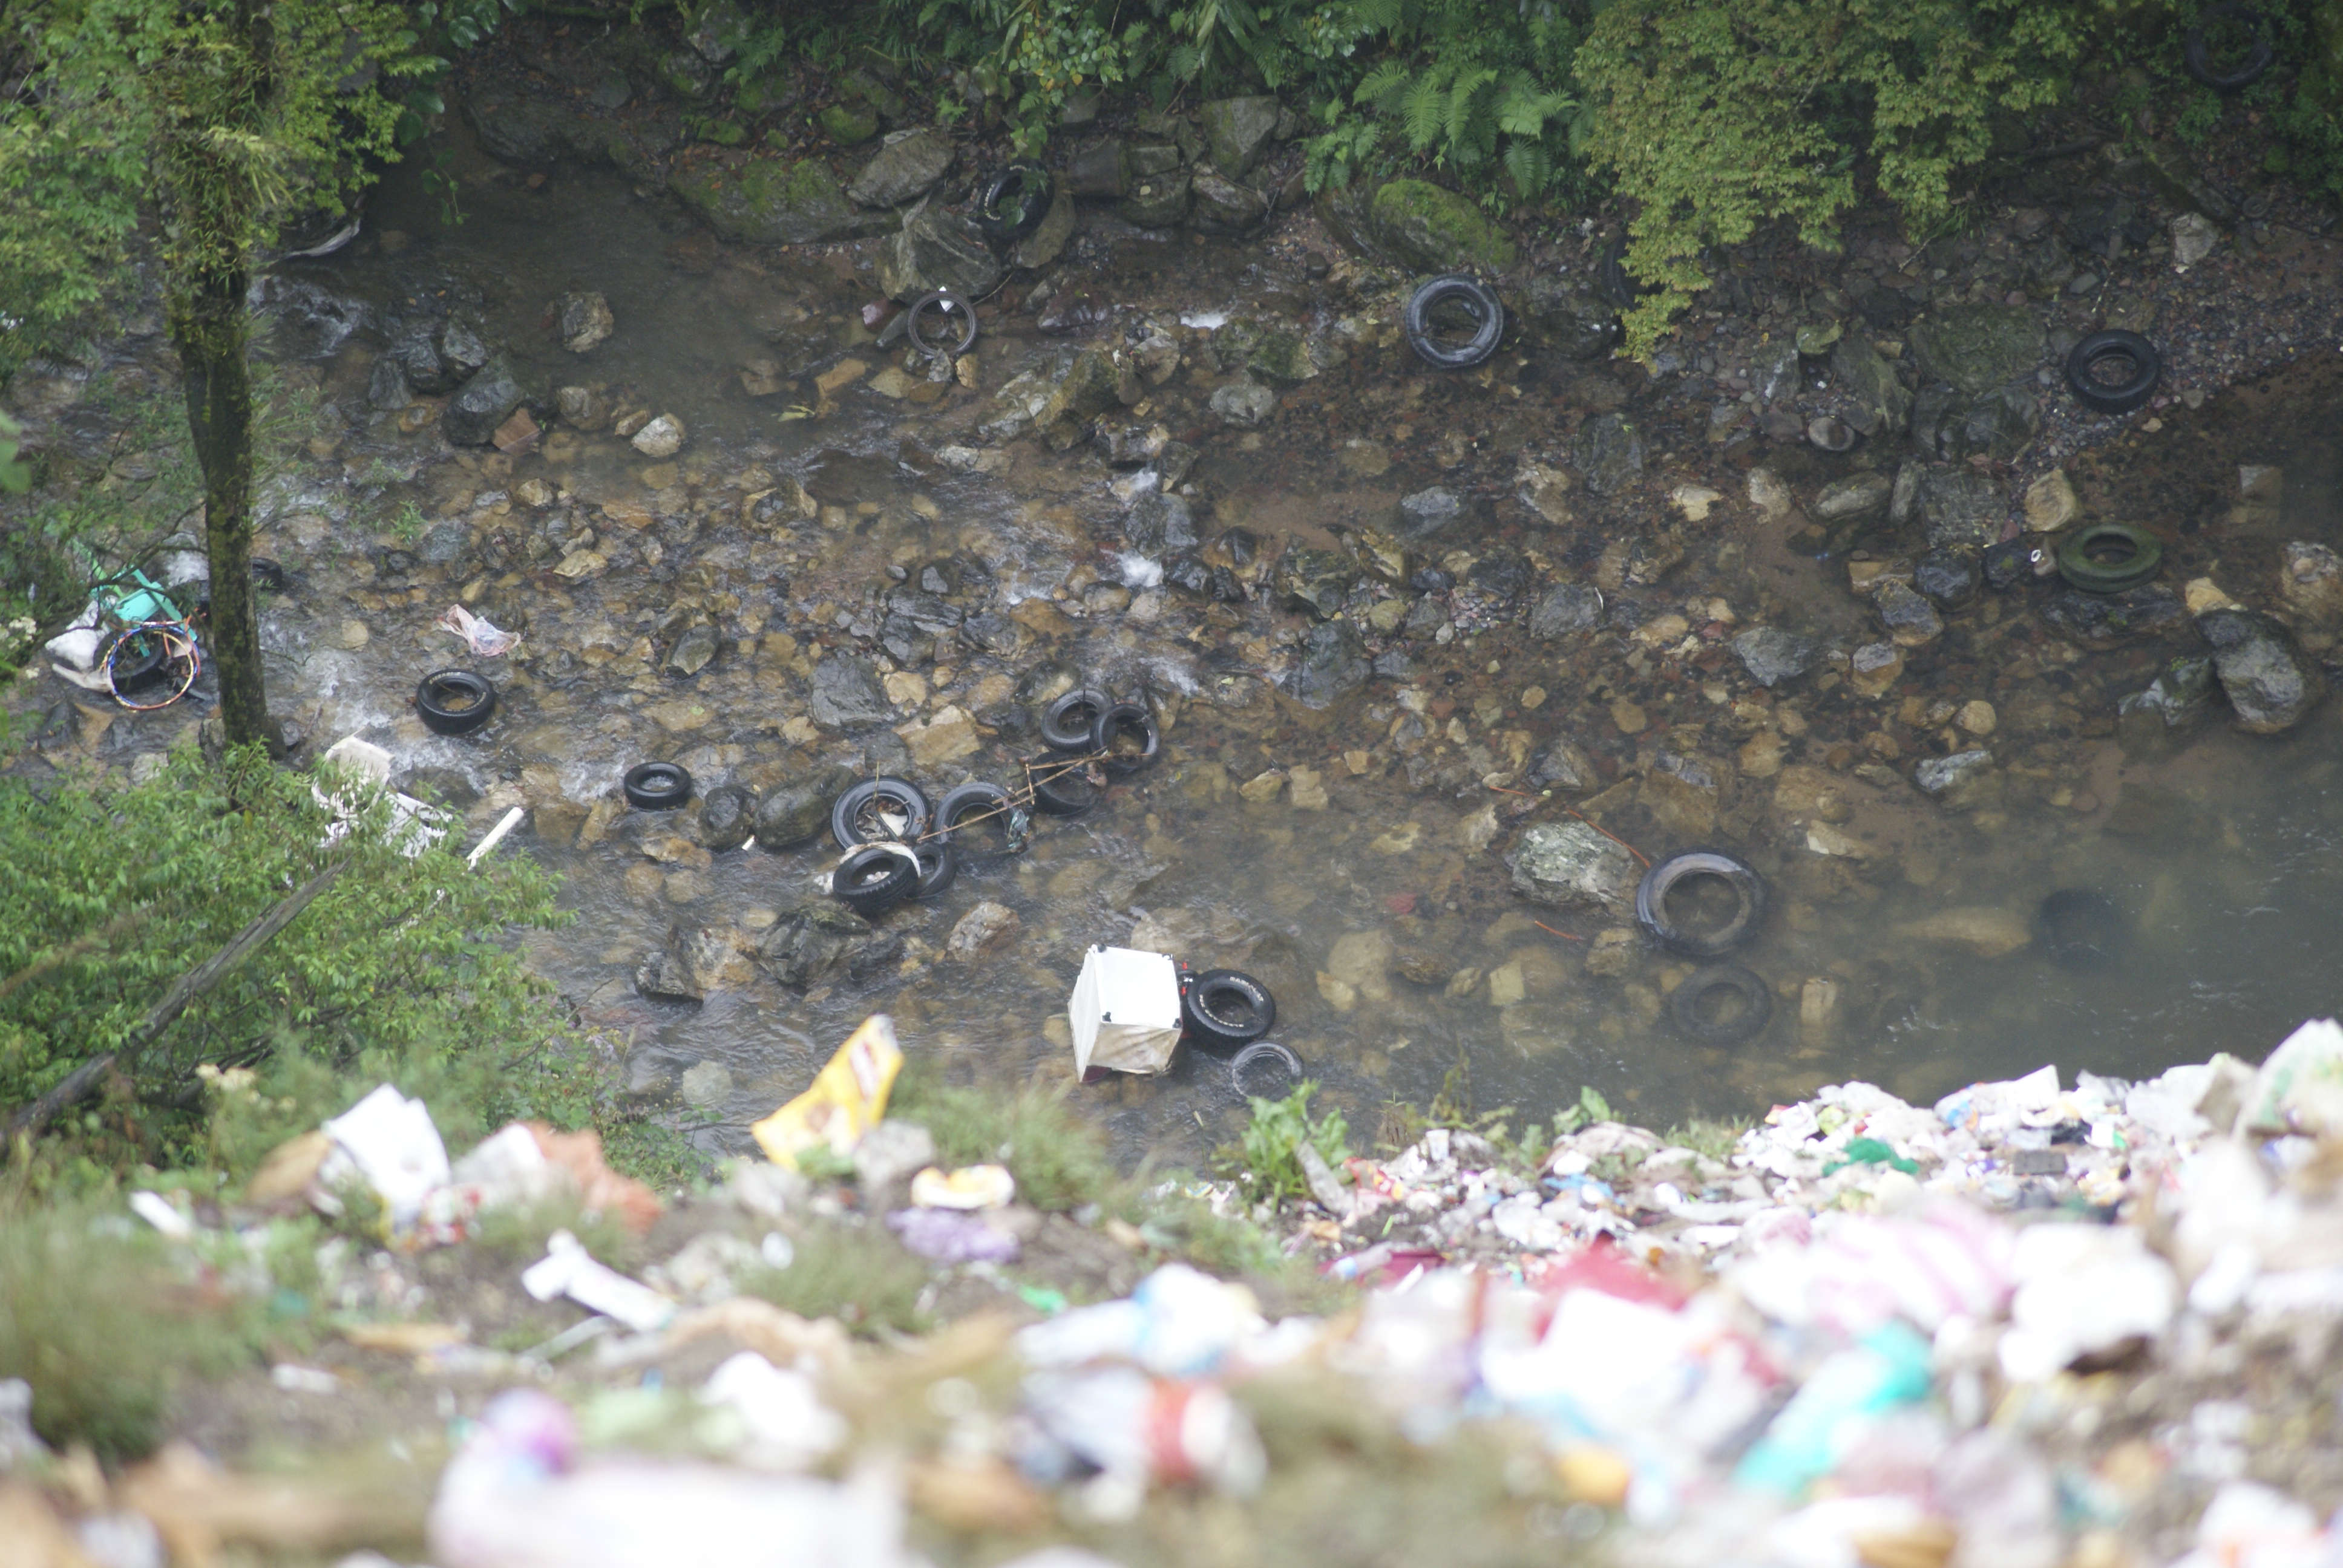 Tiraderos de basura invaden 54 kilómetros de la Interserrana